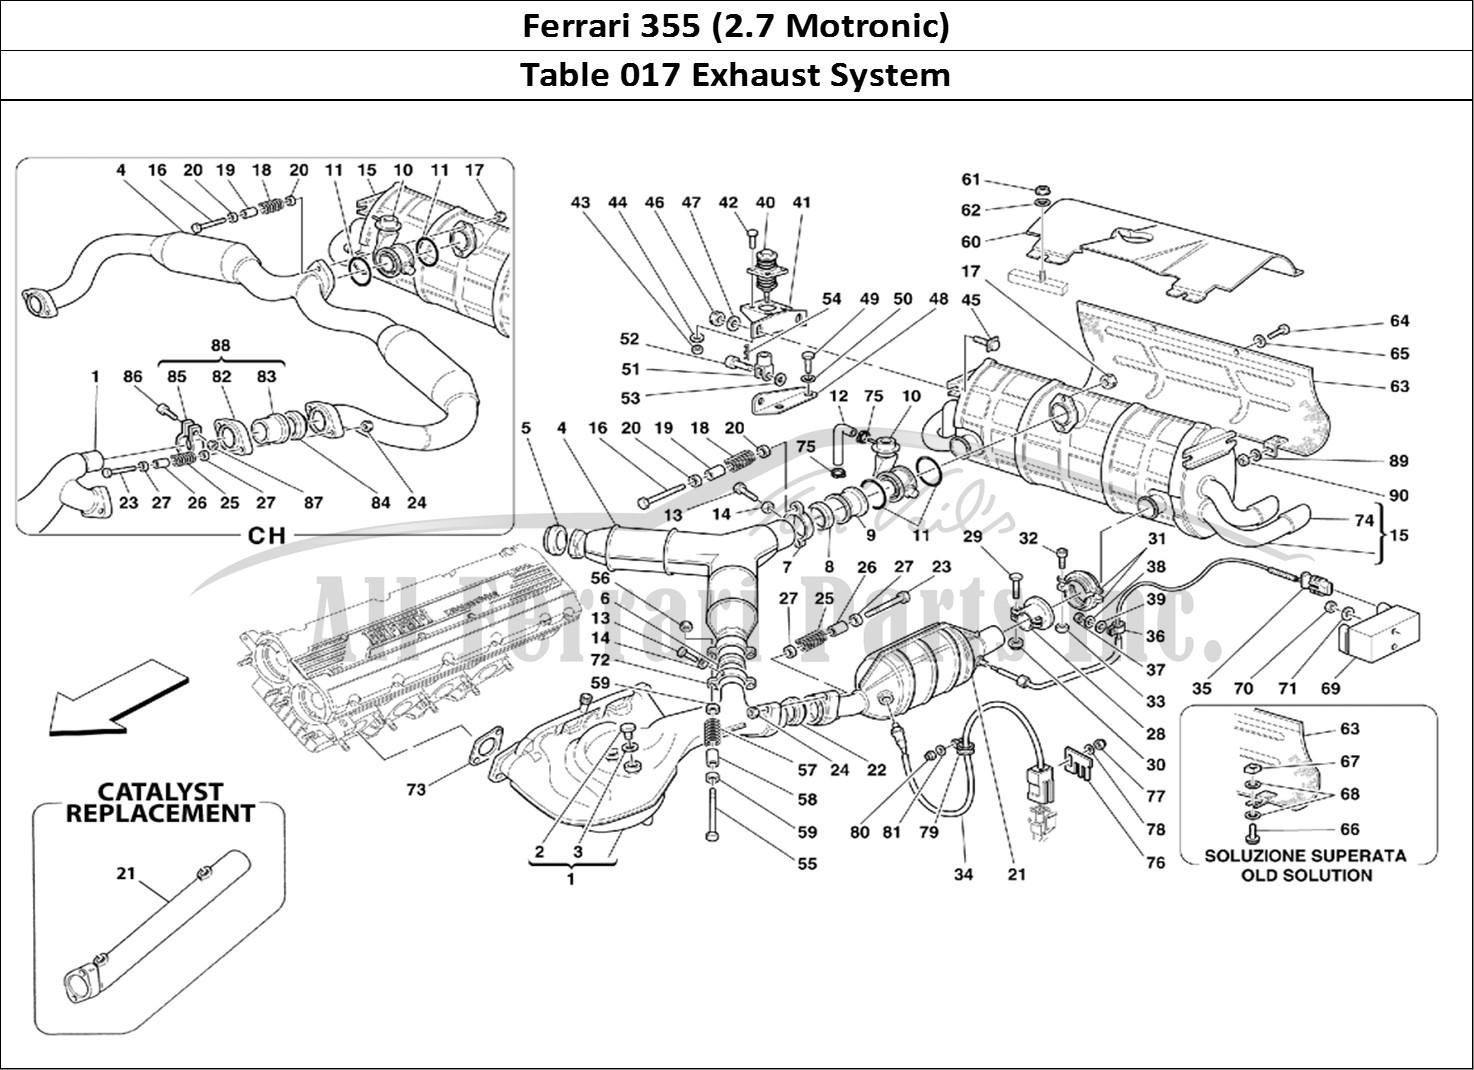 Ferrari 360 Engine Diagram Electrical Wiring Diagrams 355 Parts Smart U2022 Ford Mustang